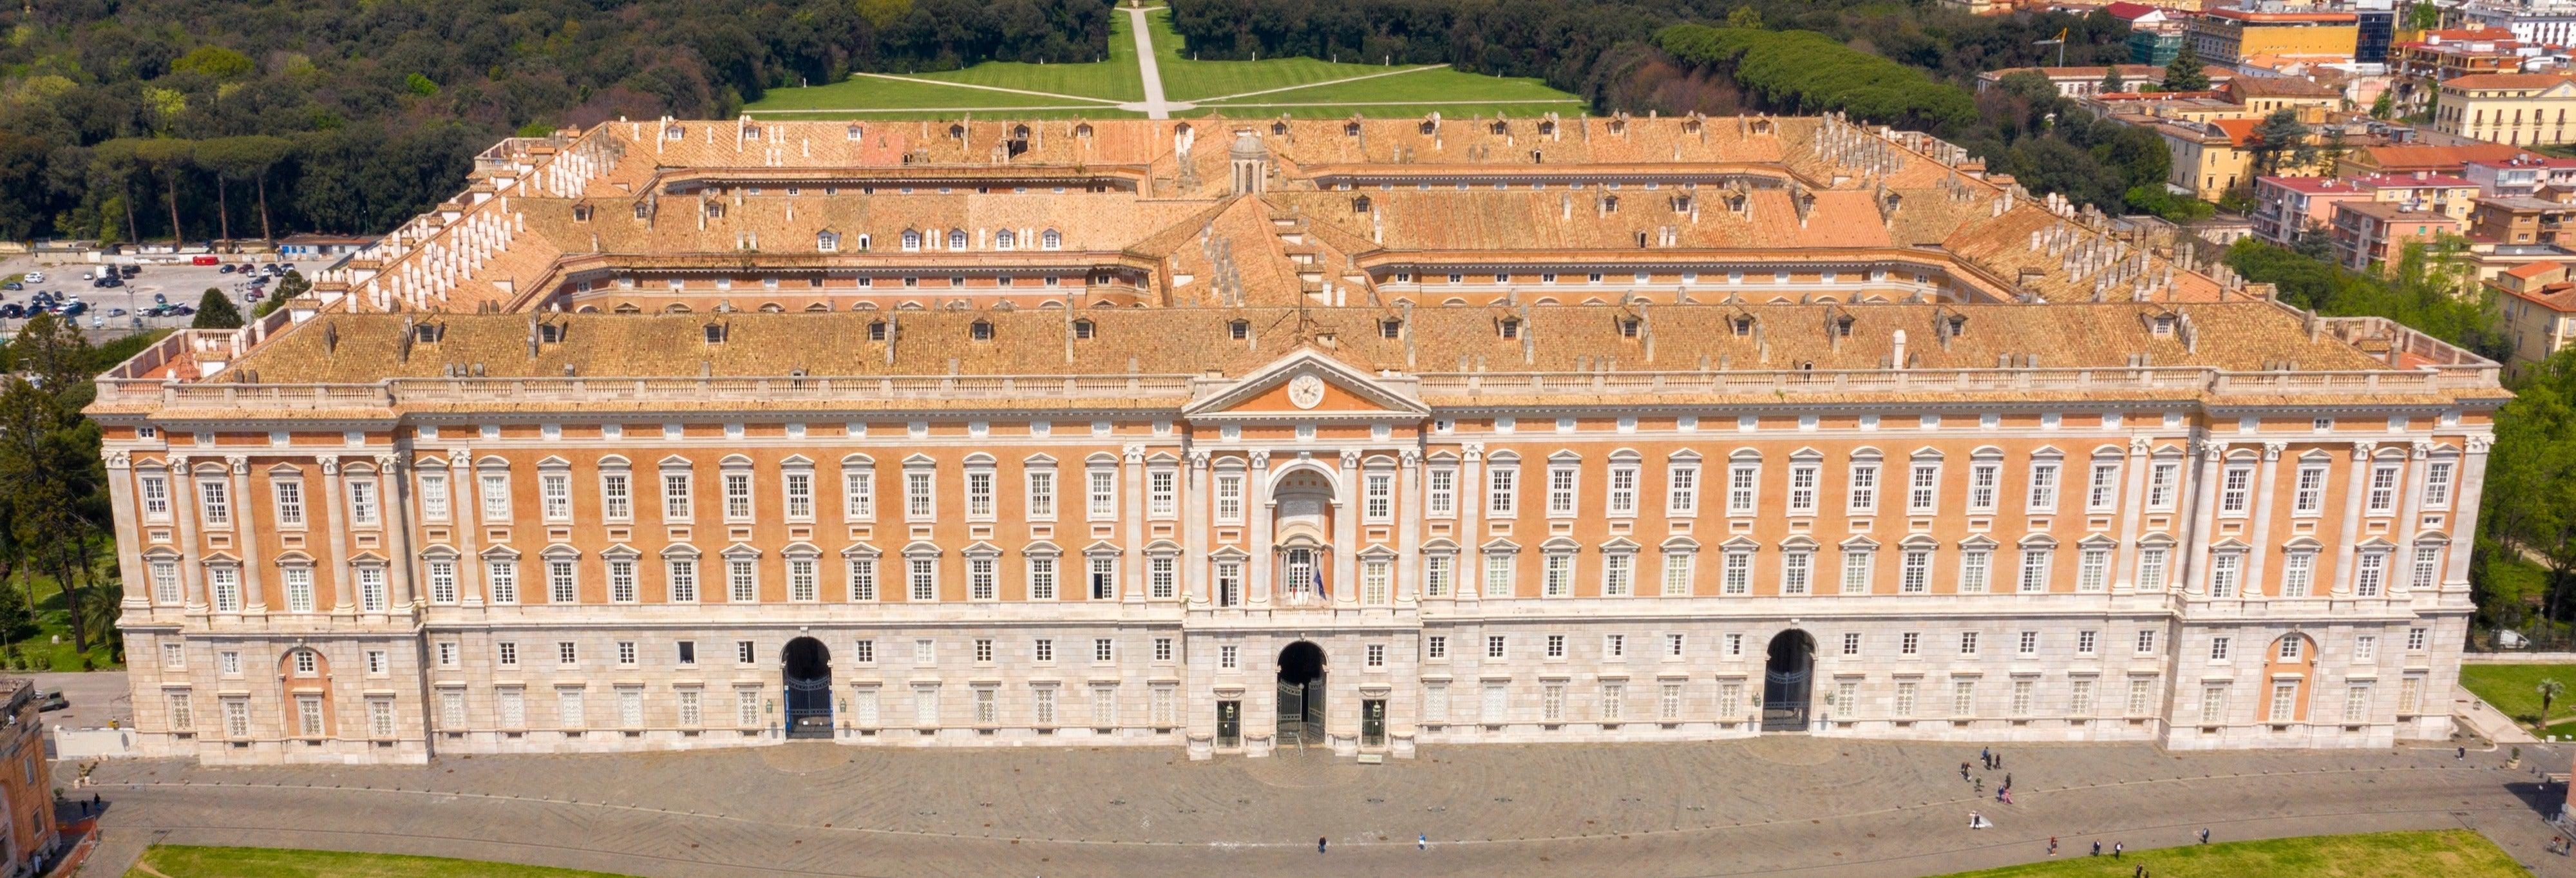 Visite privée du Palais Royal de Caserte